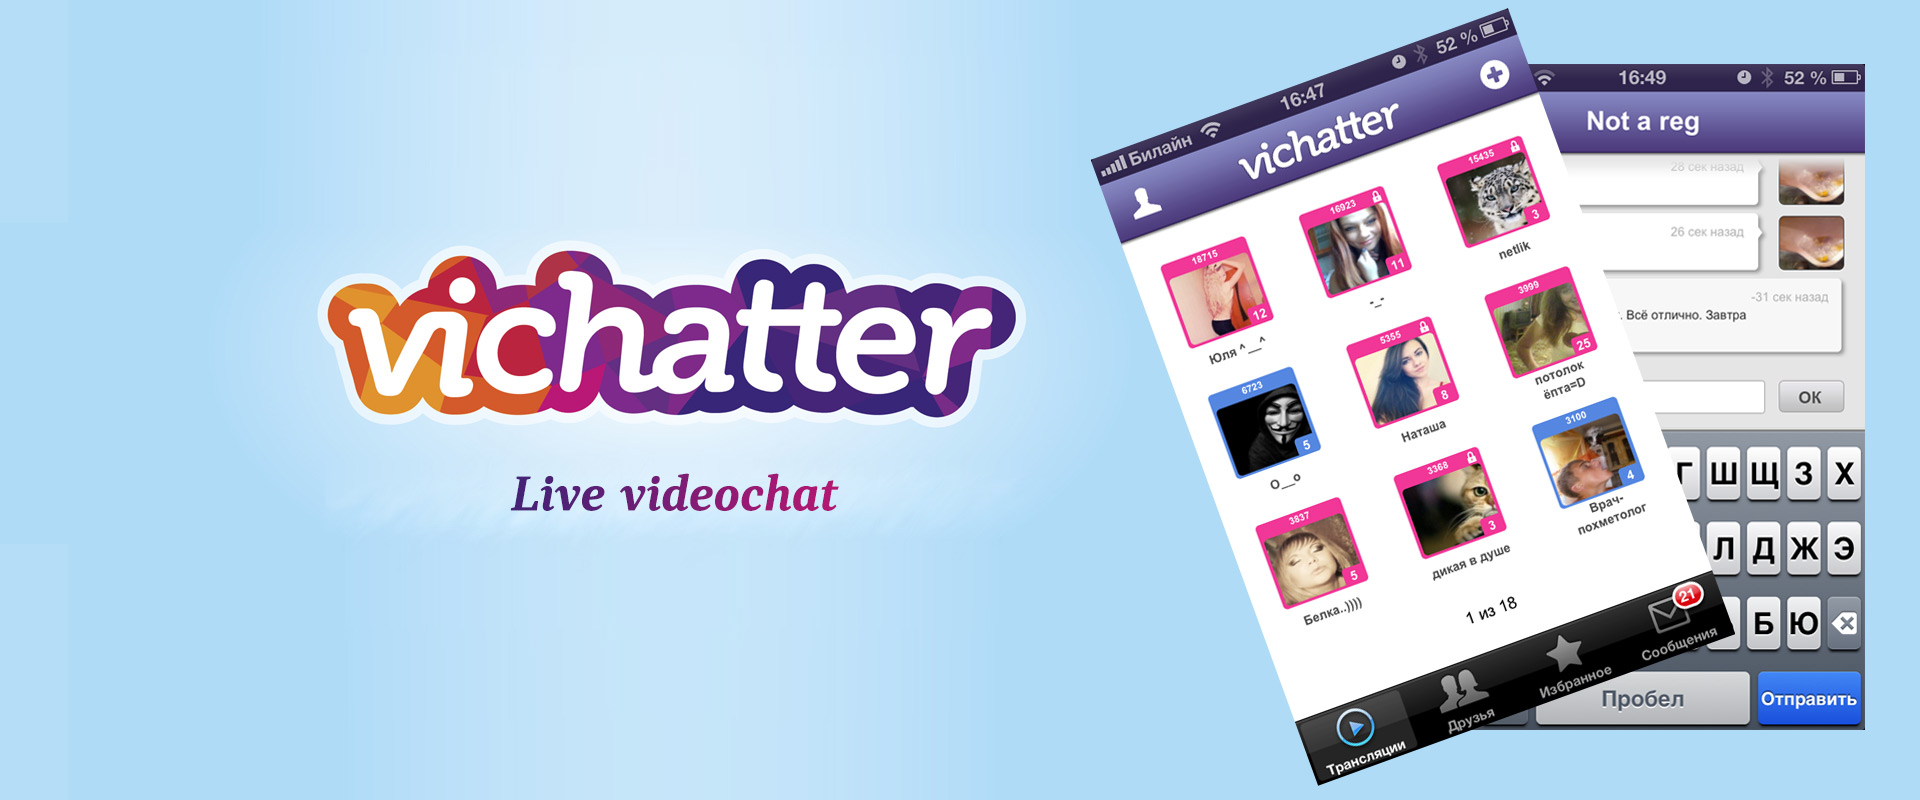 slide_app_vichatter_en